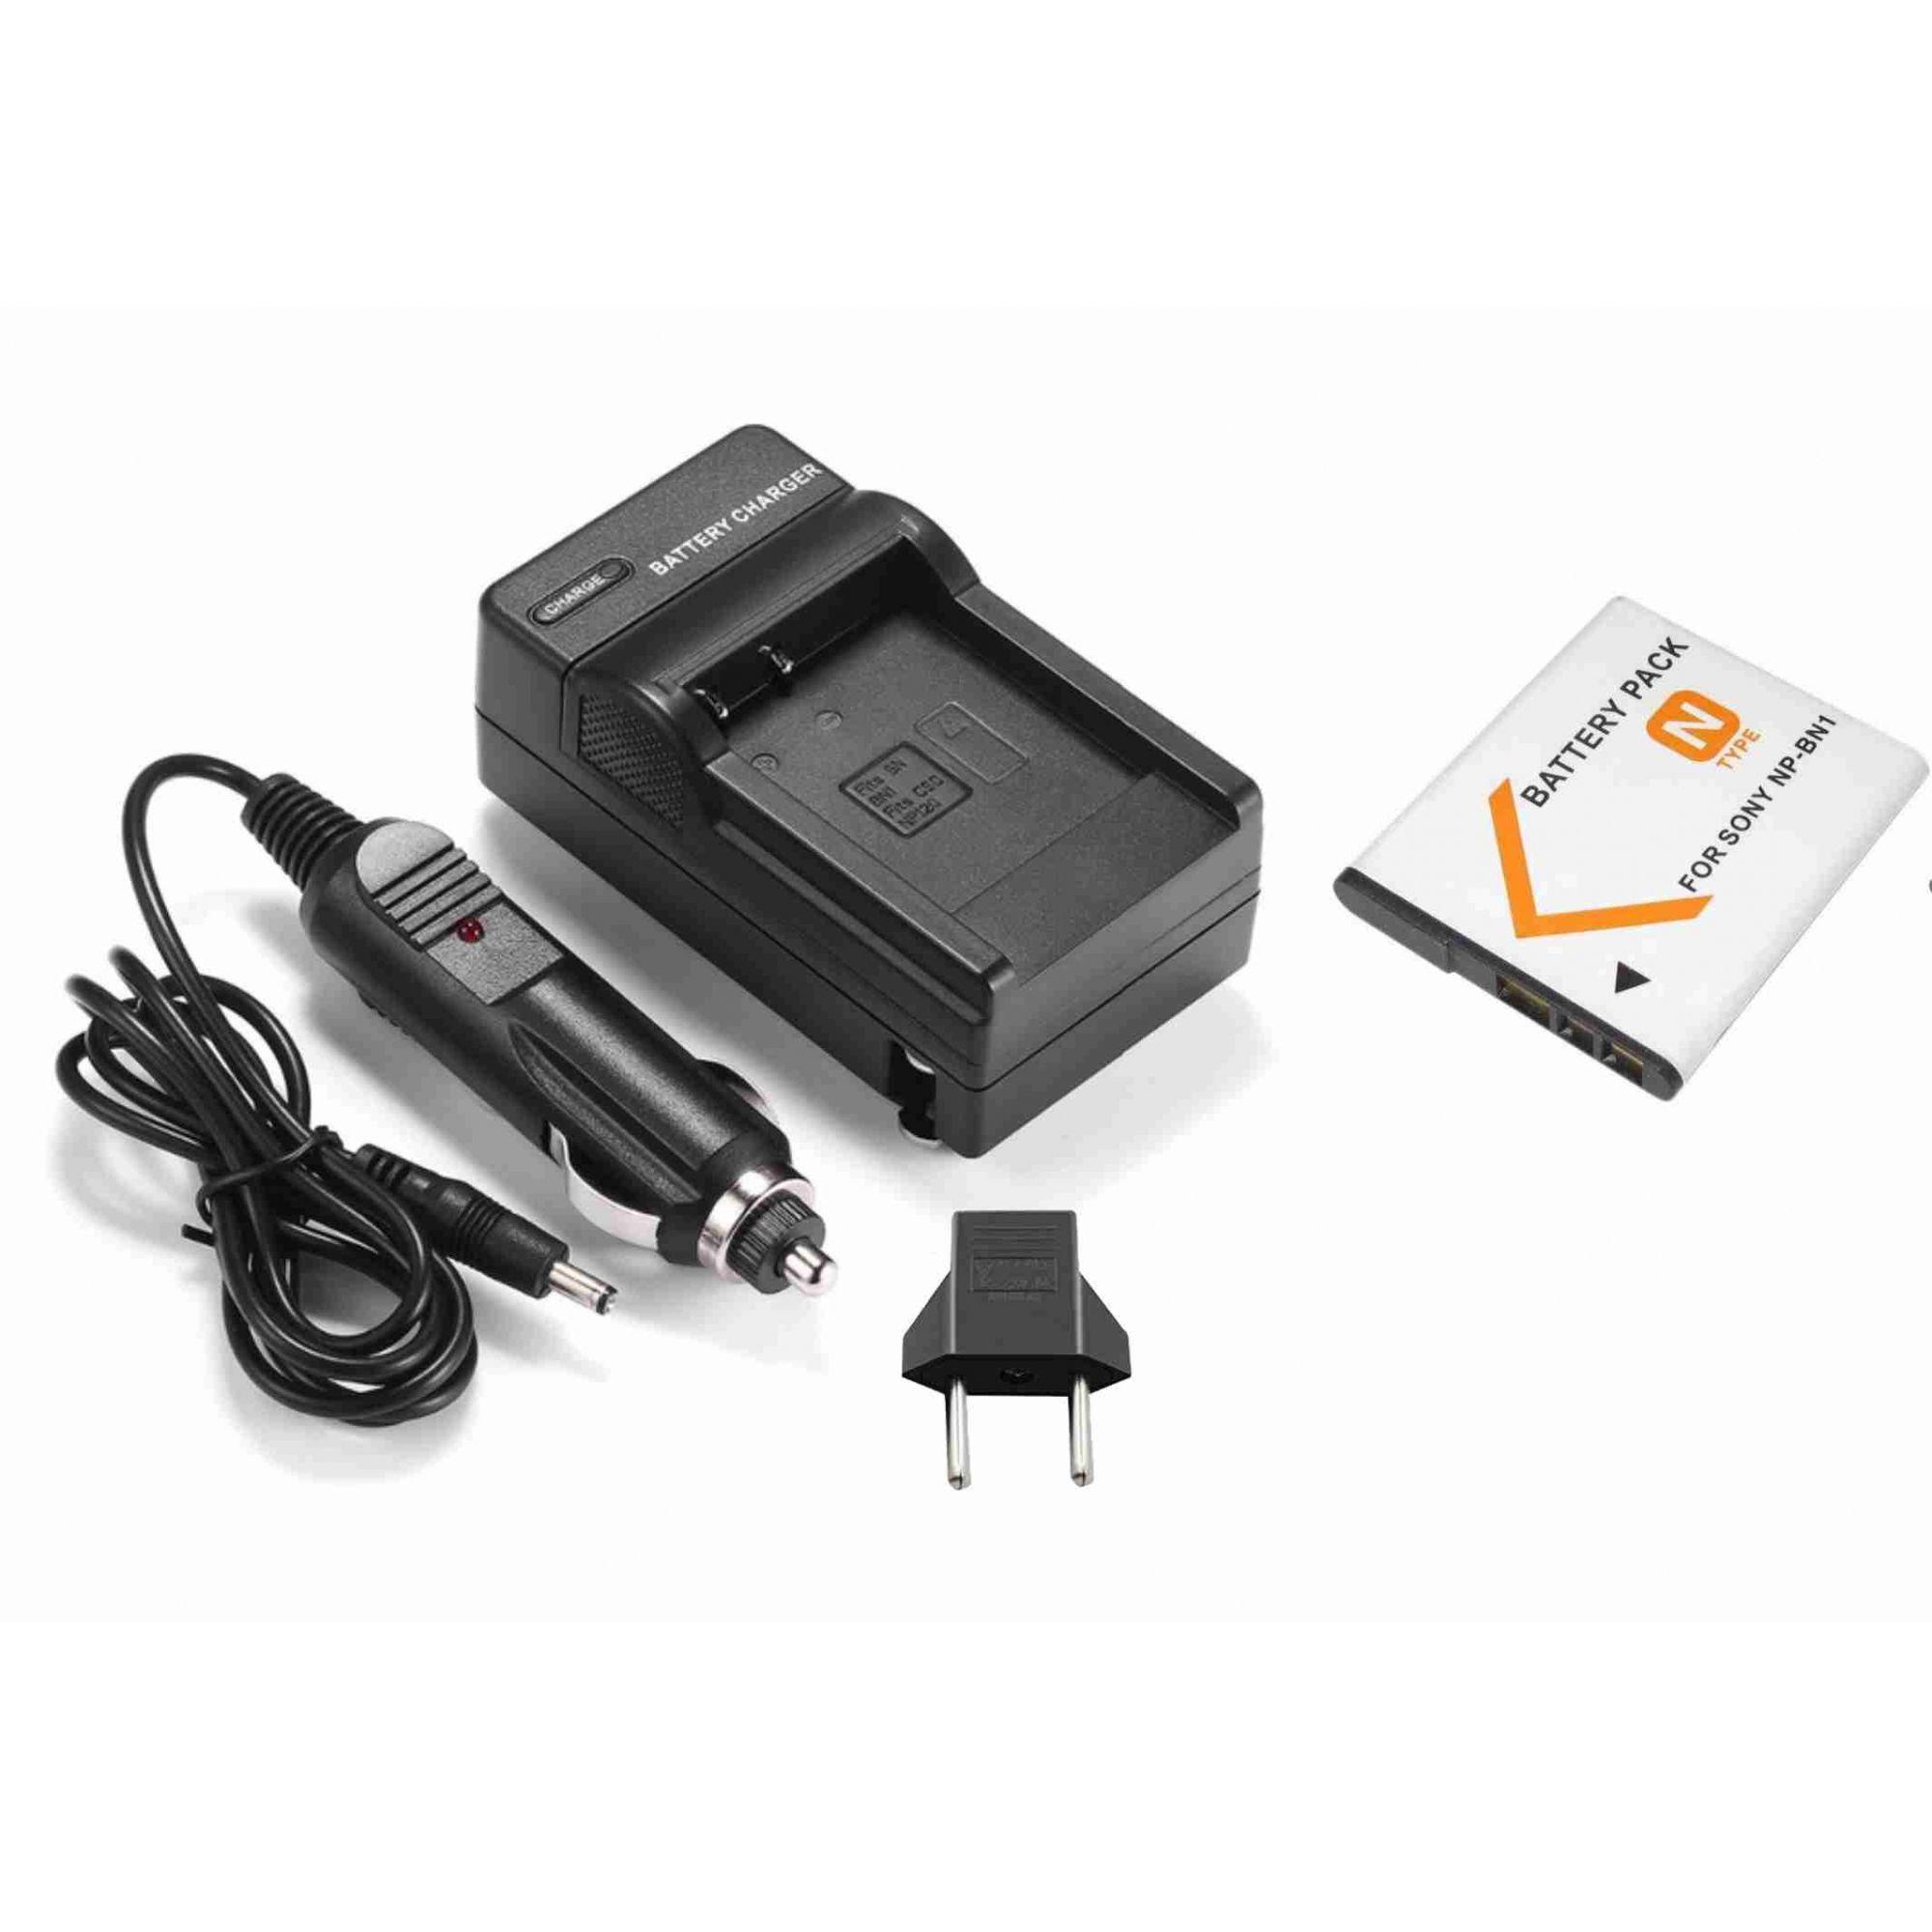 Kit Bateria NP-BN1 + carregador para Sony DSC-W10, DSC-WX7, DSC-T110, DSC-TX5, DSC-T99D, DSC-J10